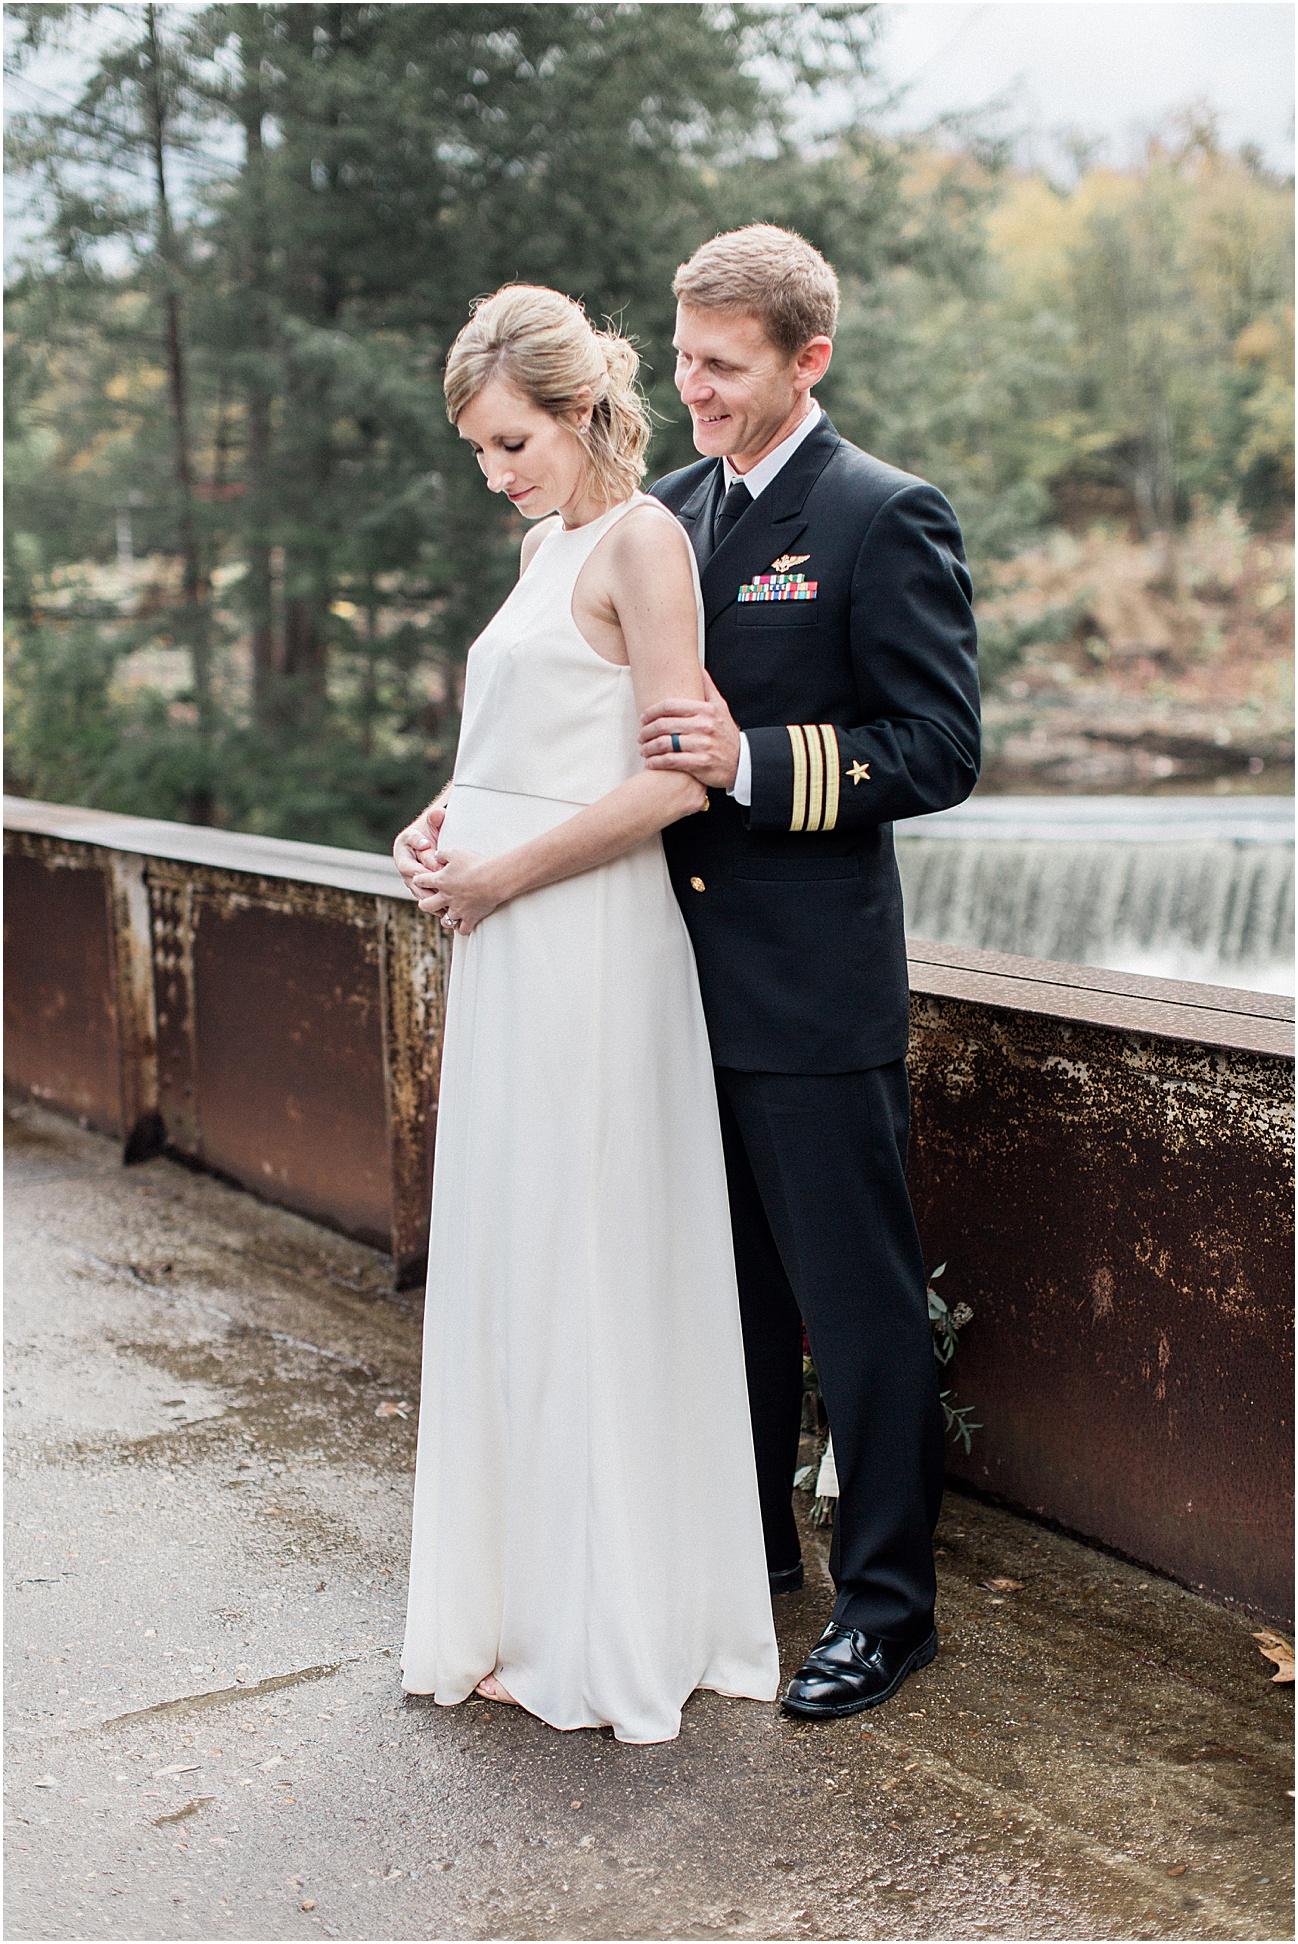 lauren_john_jon_ablany_browns_brewery_moses_farm_fall_cape_cod_boston_wedding_photographer_meredith_jane_photography_photo_1514.jpg